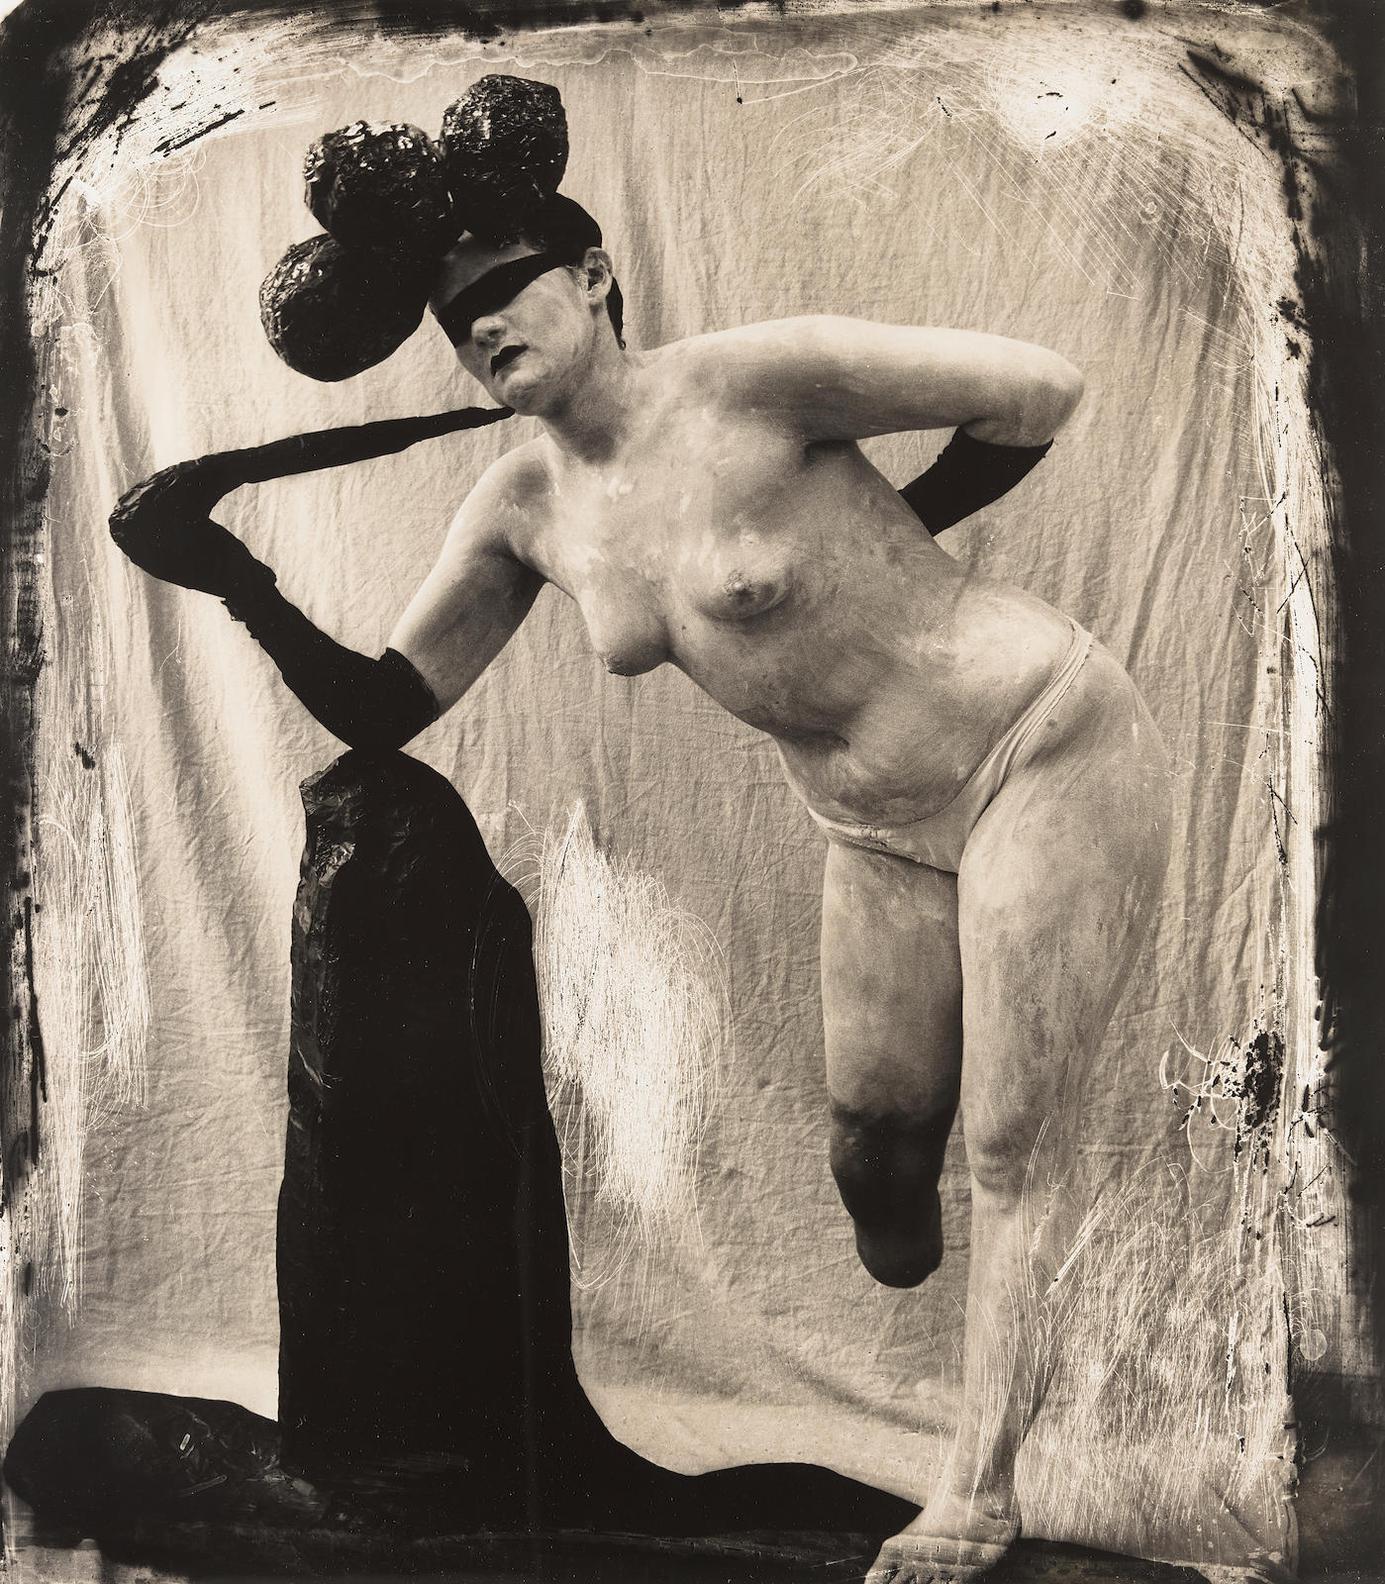 Joel-Peter Witkin-La Serpentine, Marseilles-1992